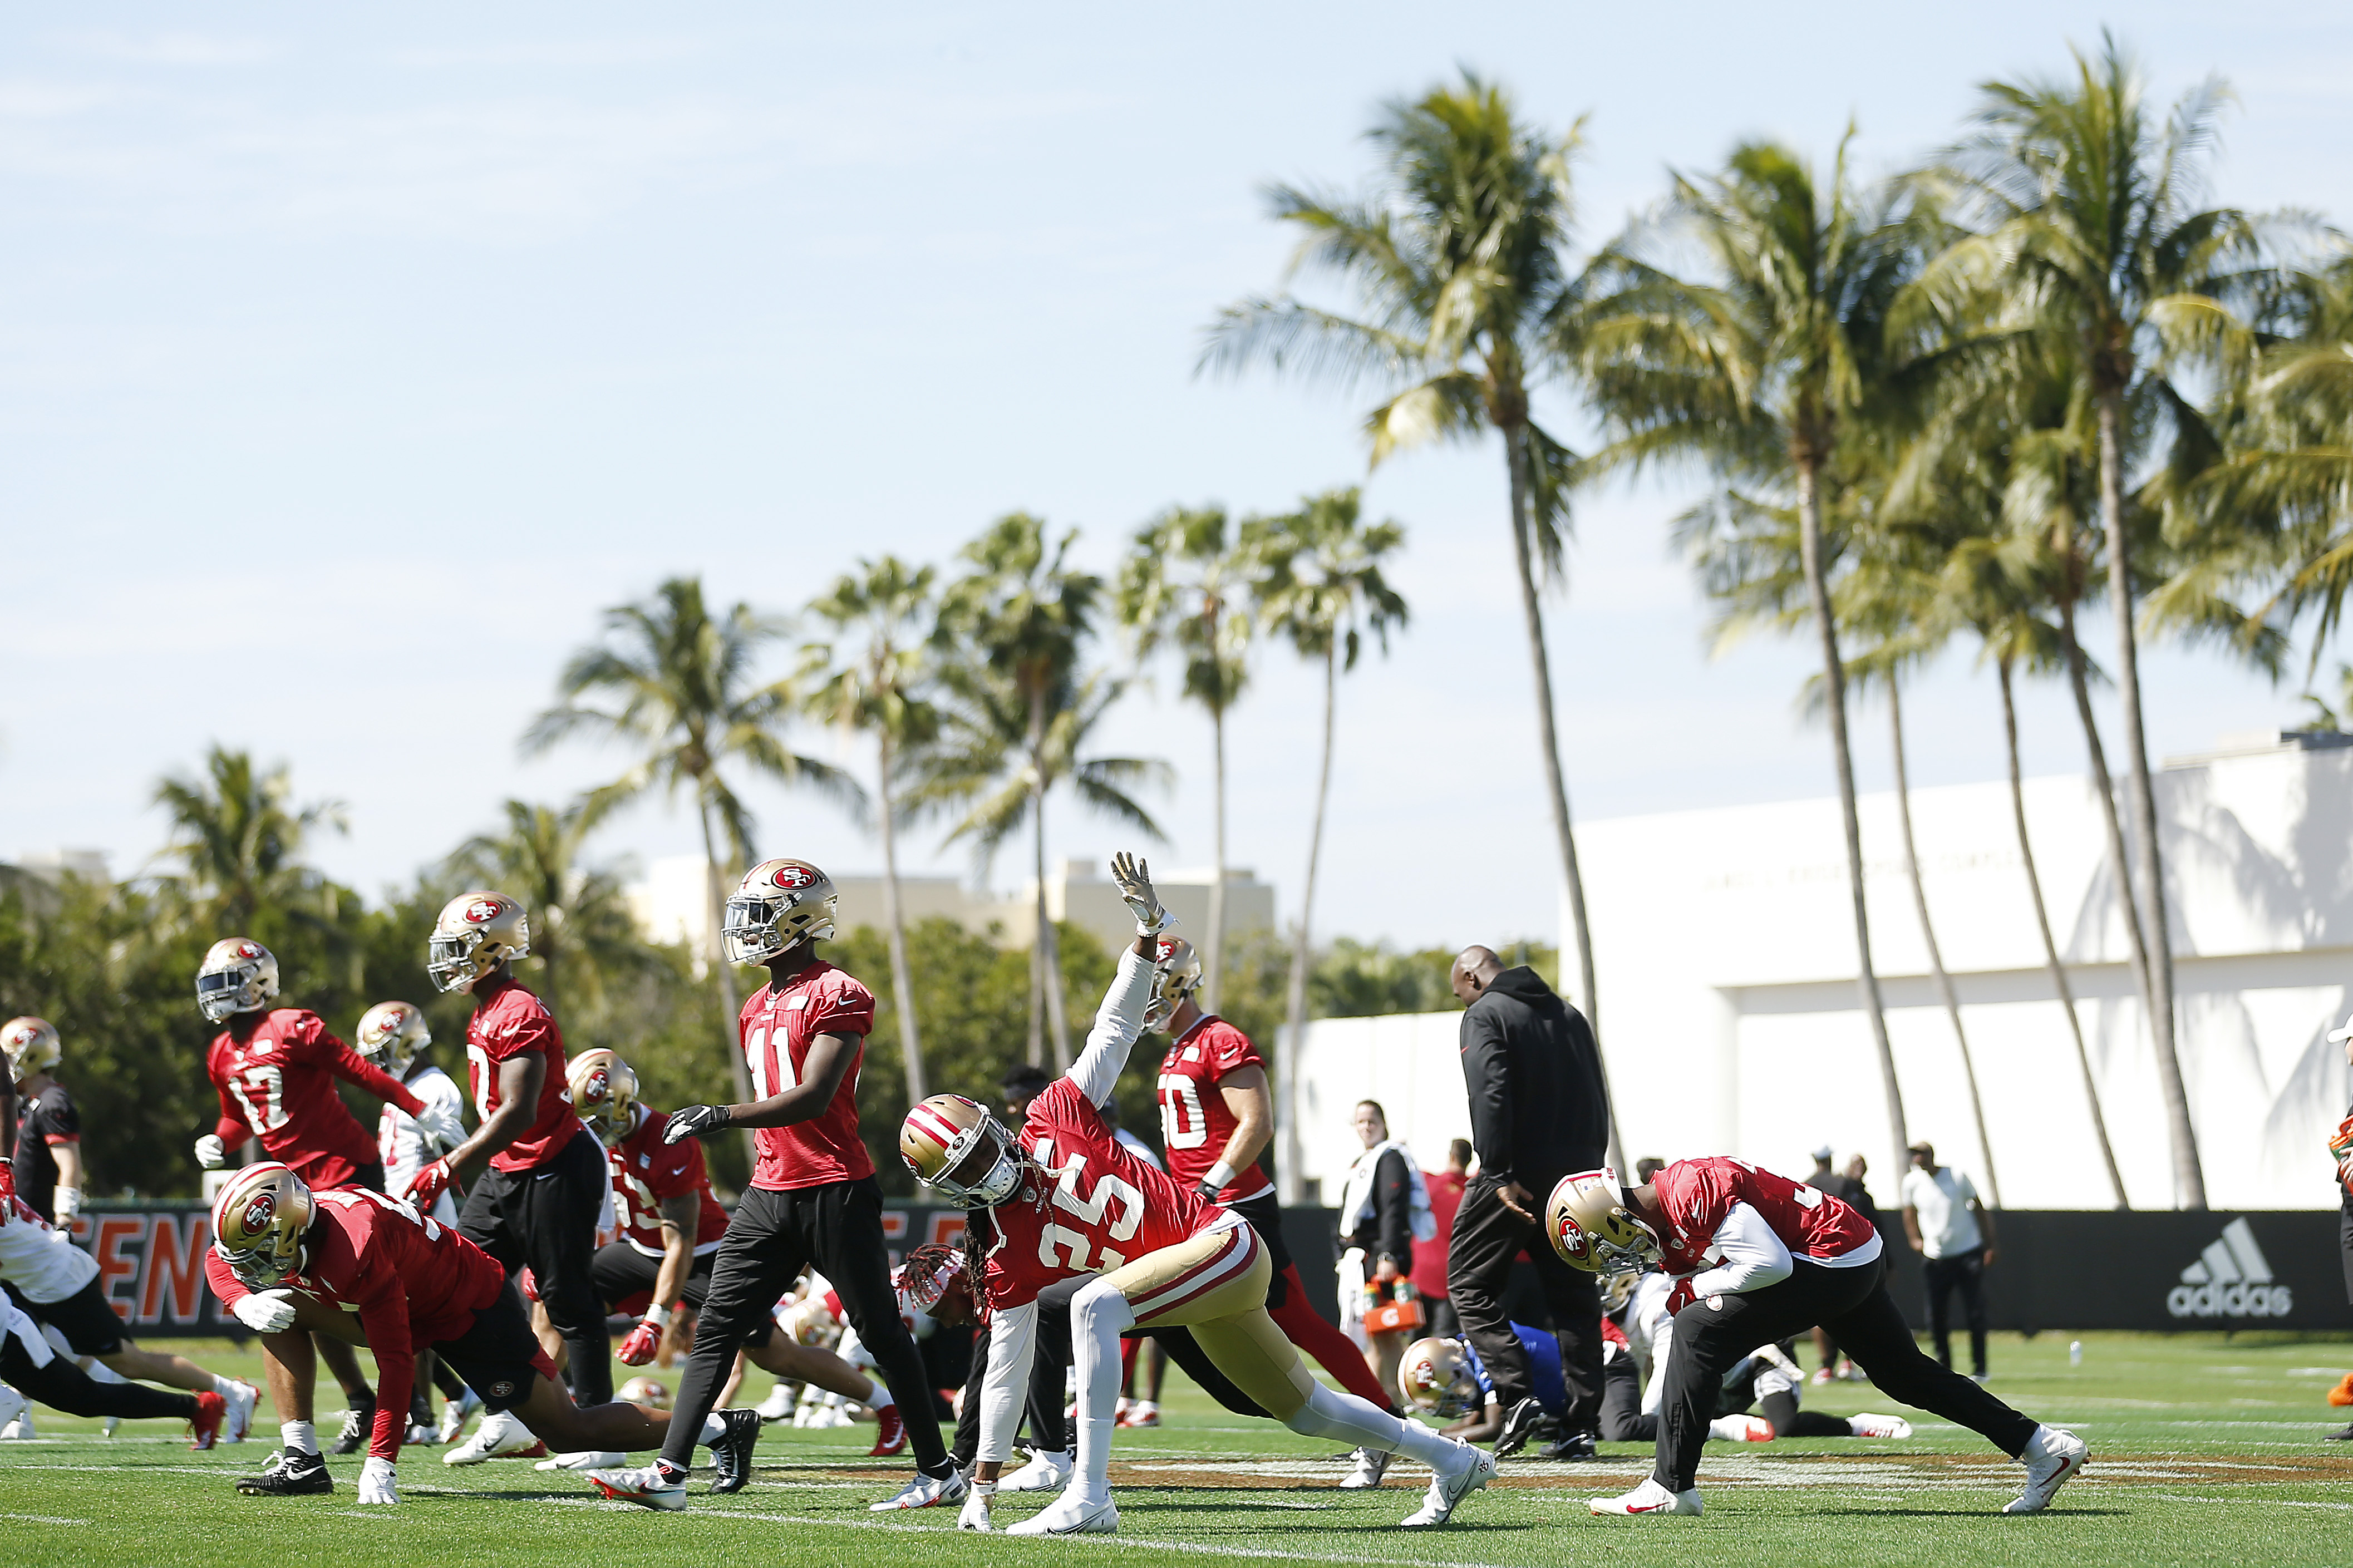 San Francisco 49ers Practice